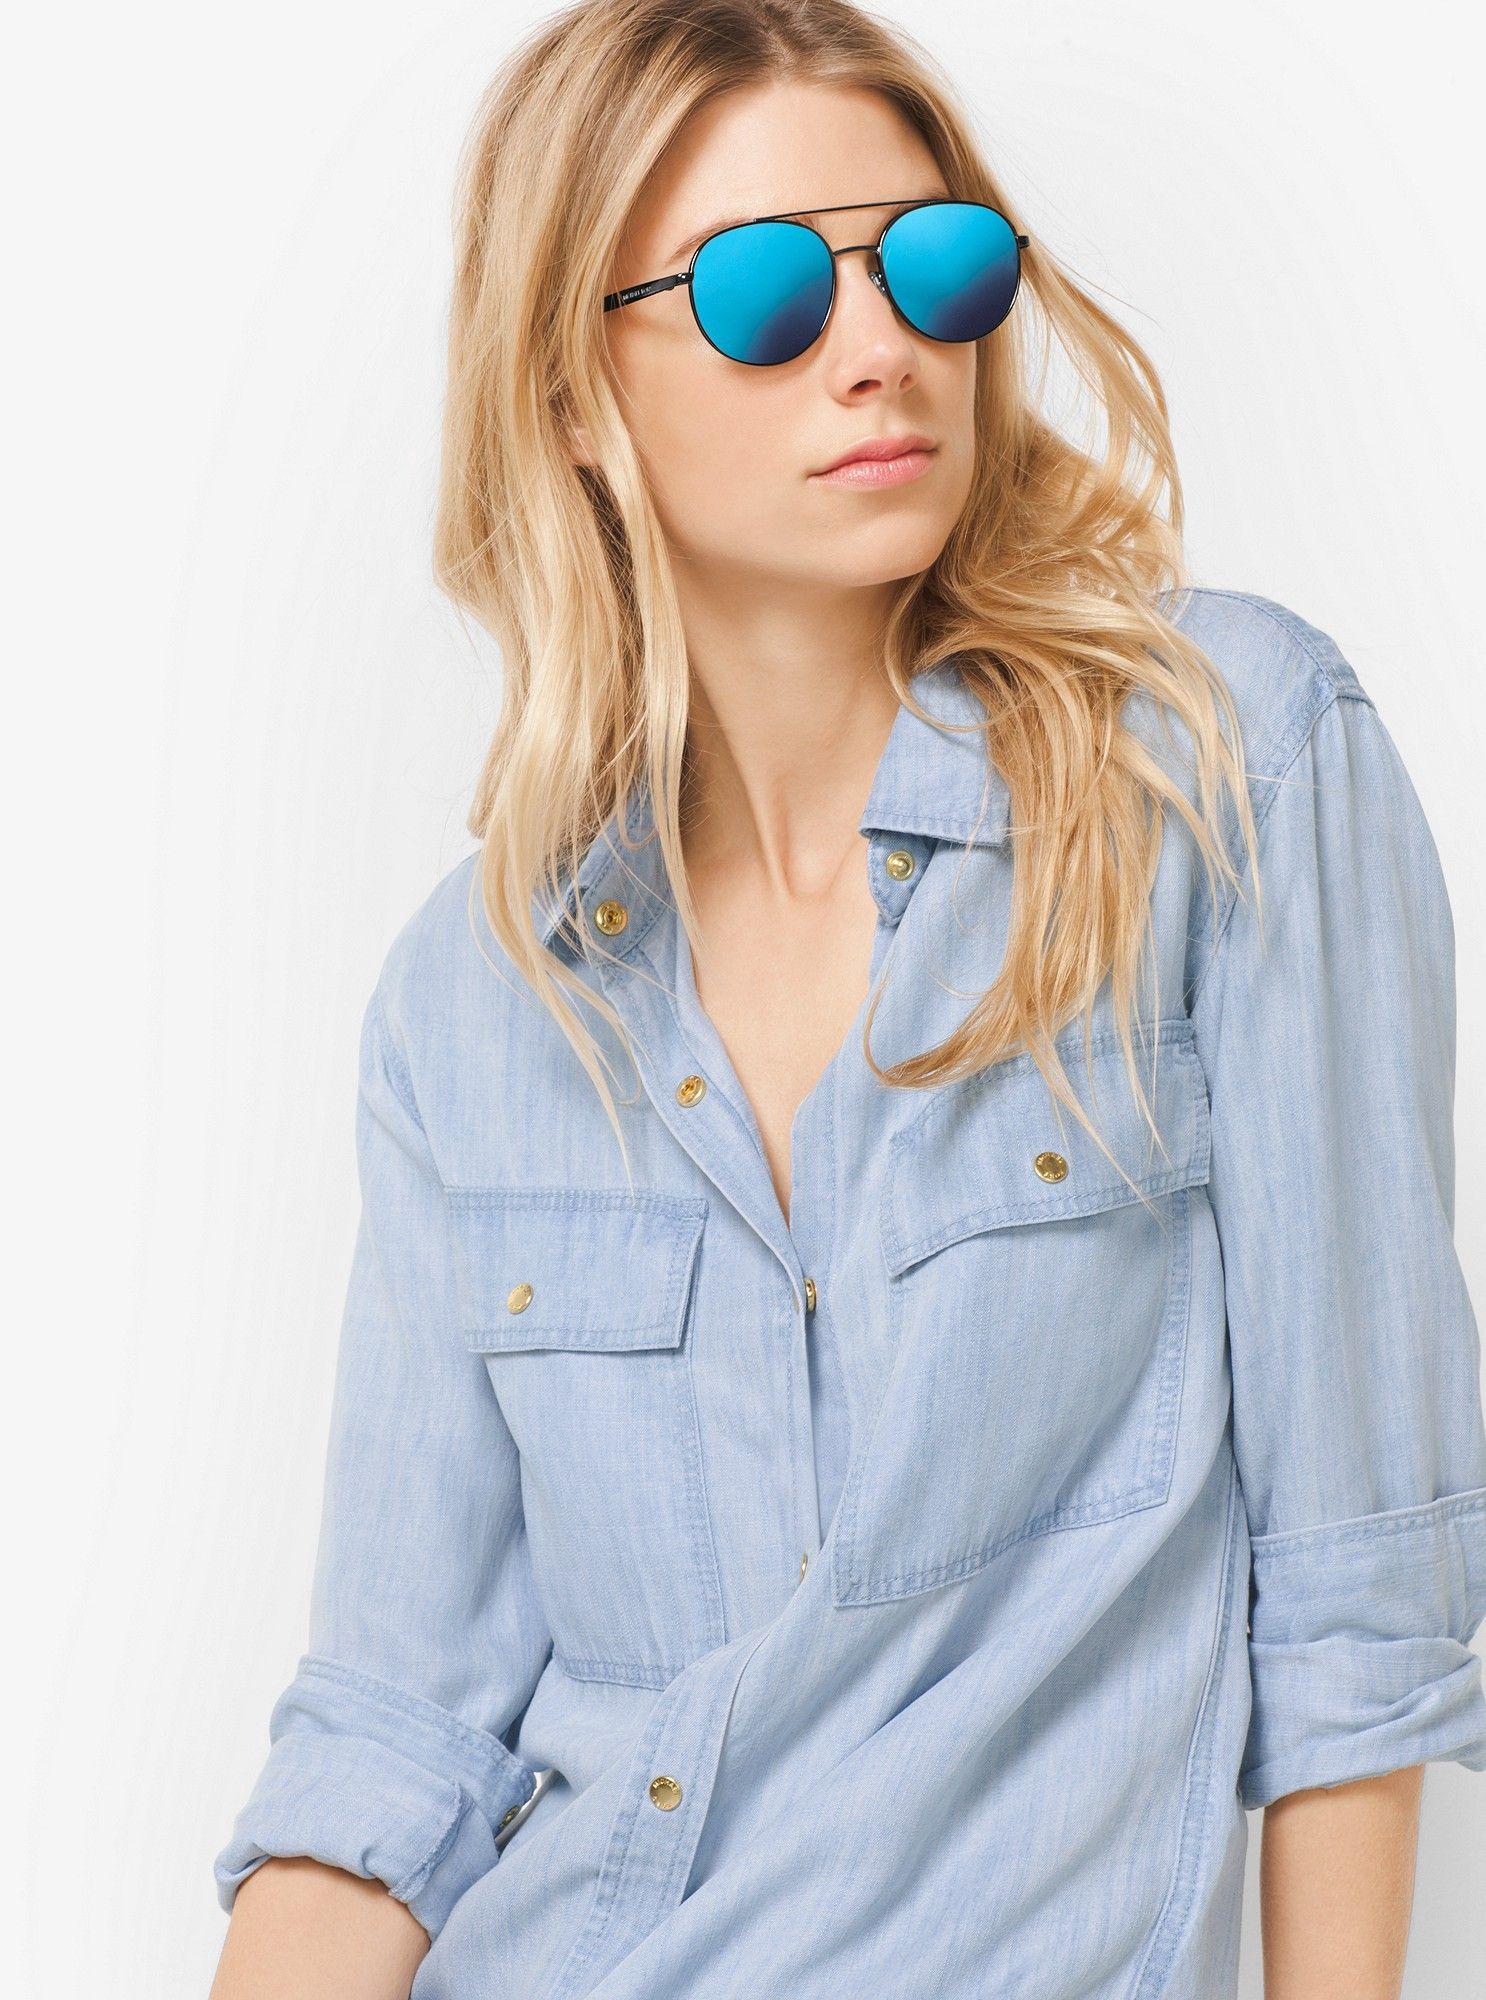 0f9add3667f031 Michael Kors Lon Rounded Aviator Sunglasses - Rose Gold Flash